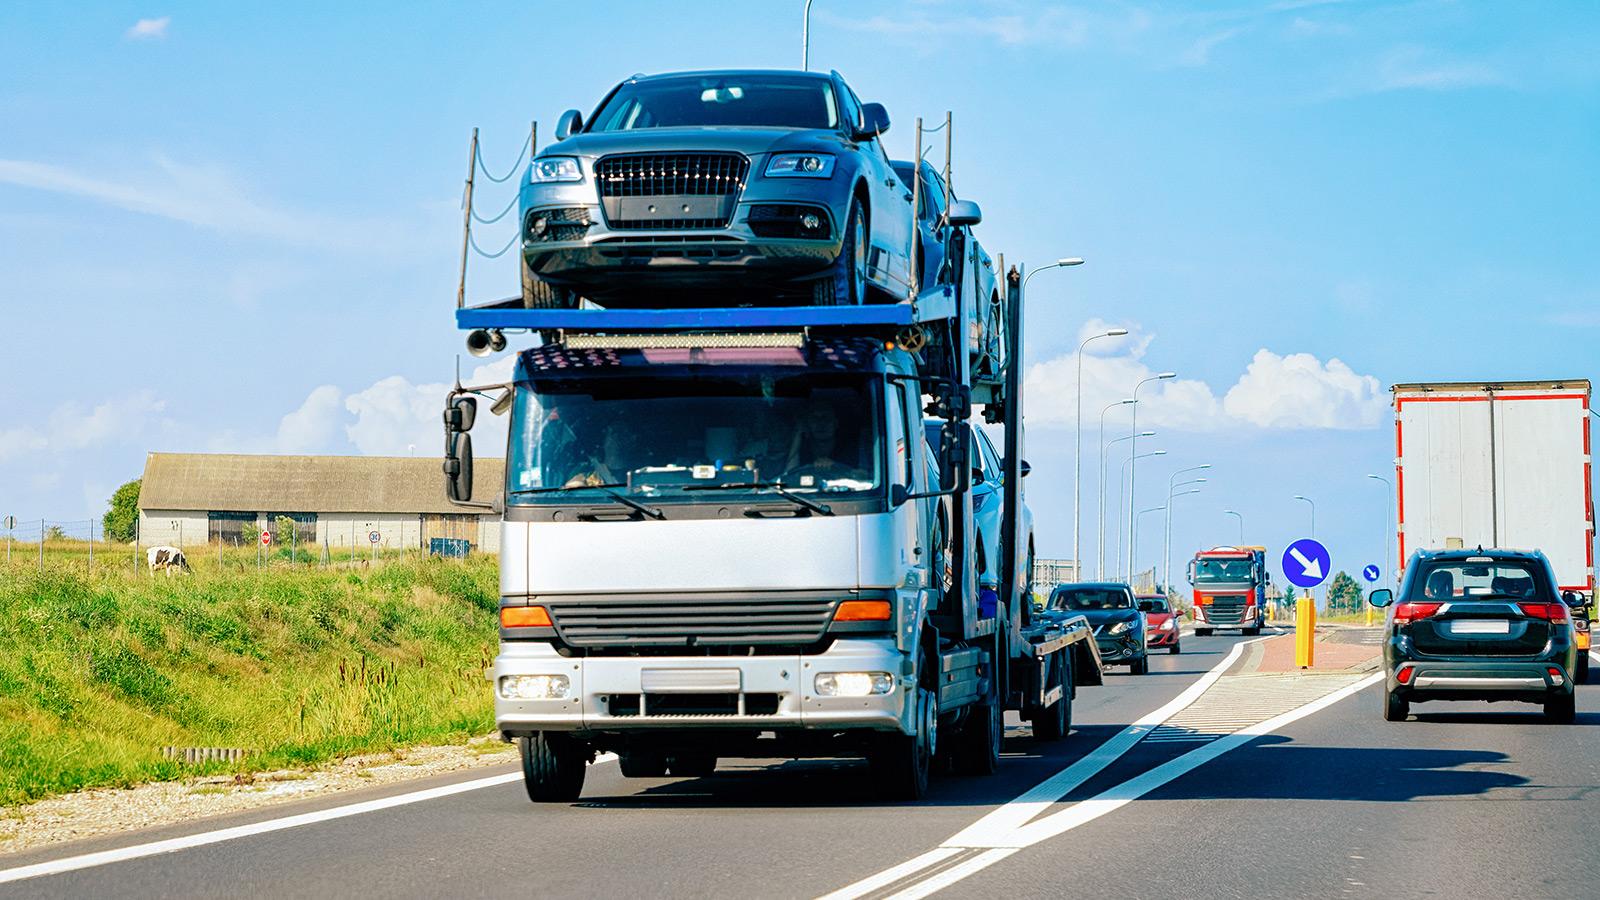 national car shipping service contact Ship a Car, Inc